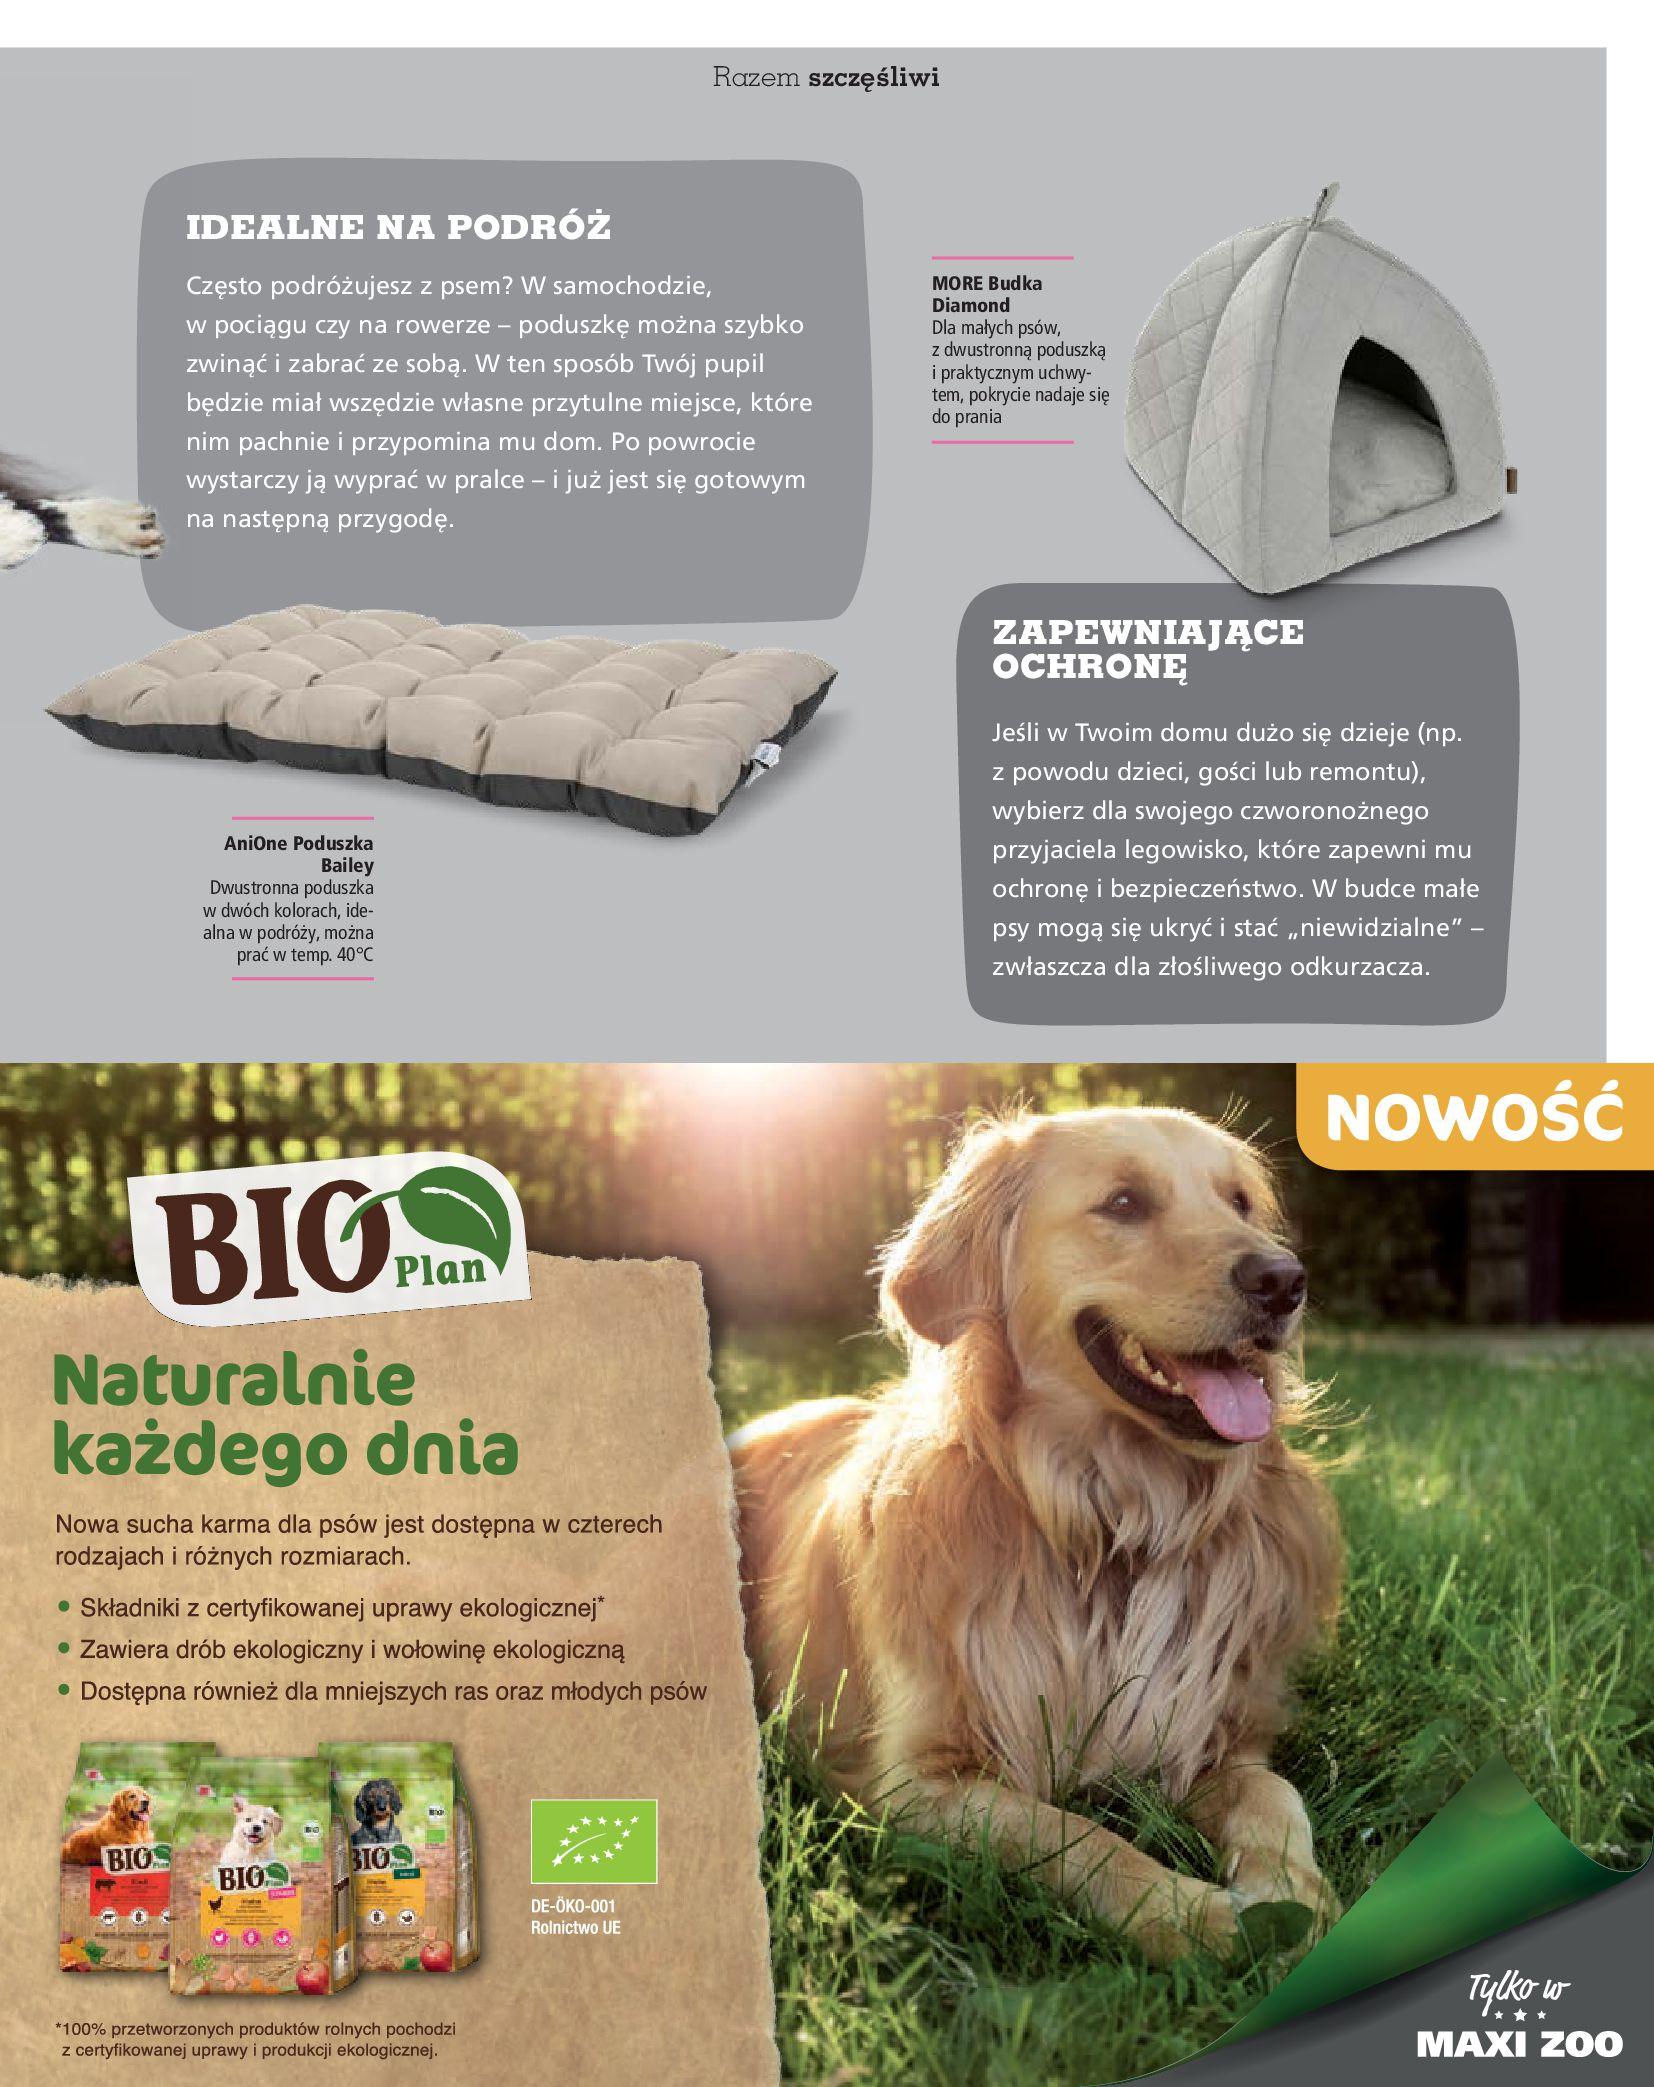 Gazetka Maxi Zoo: Gazetka Maxi Zoo 2021-08-09 page-47